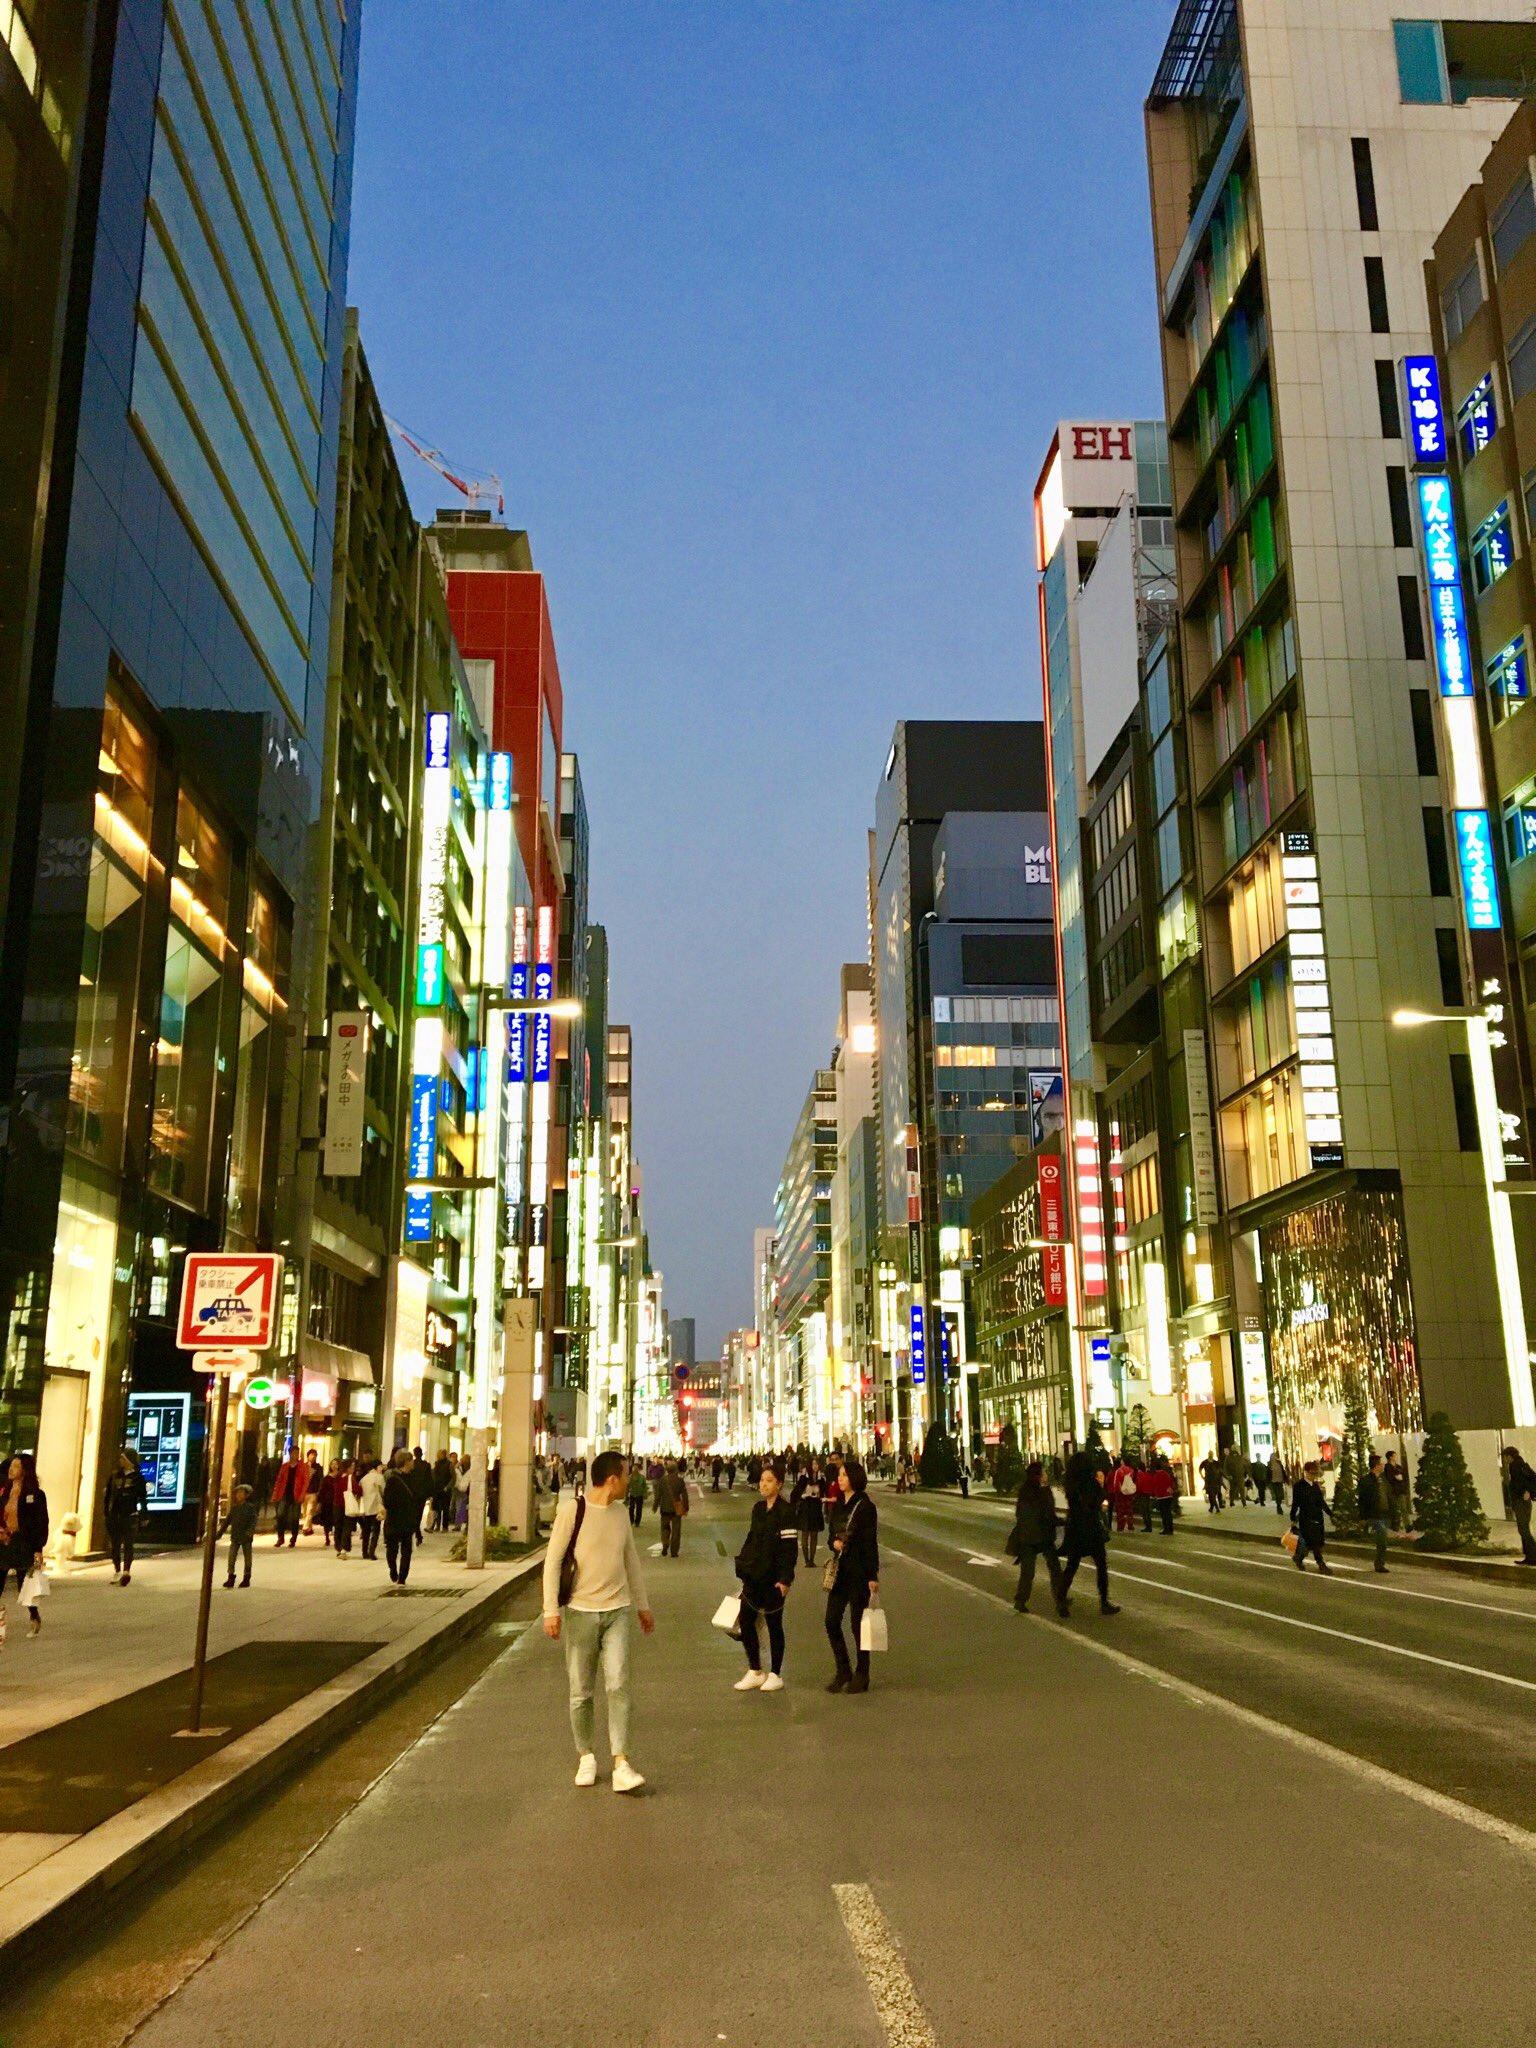 Streets of Tokyo. #POTUSInAsia https://t.co/b7foTPVPb8